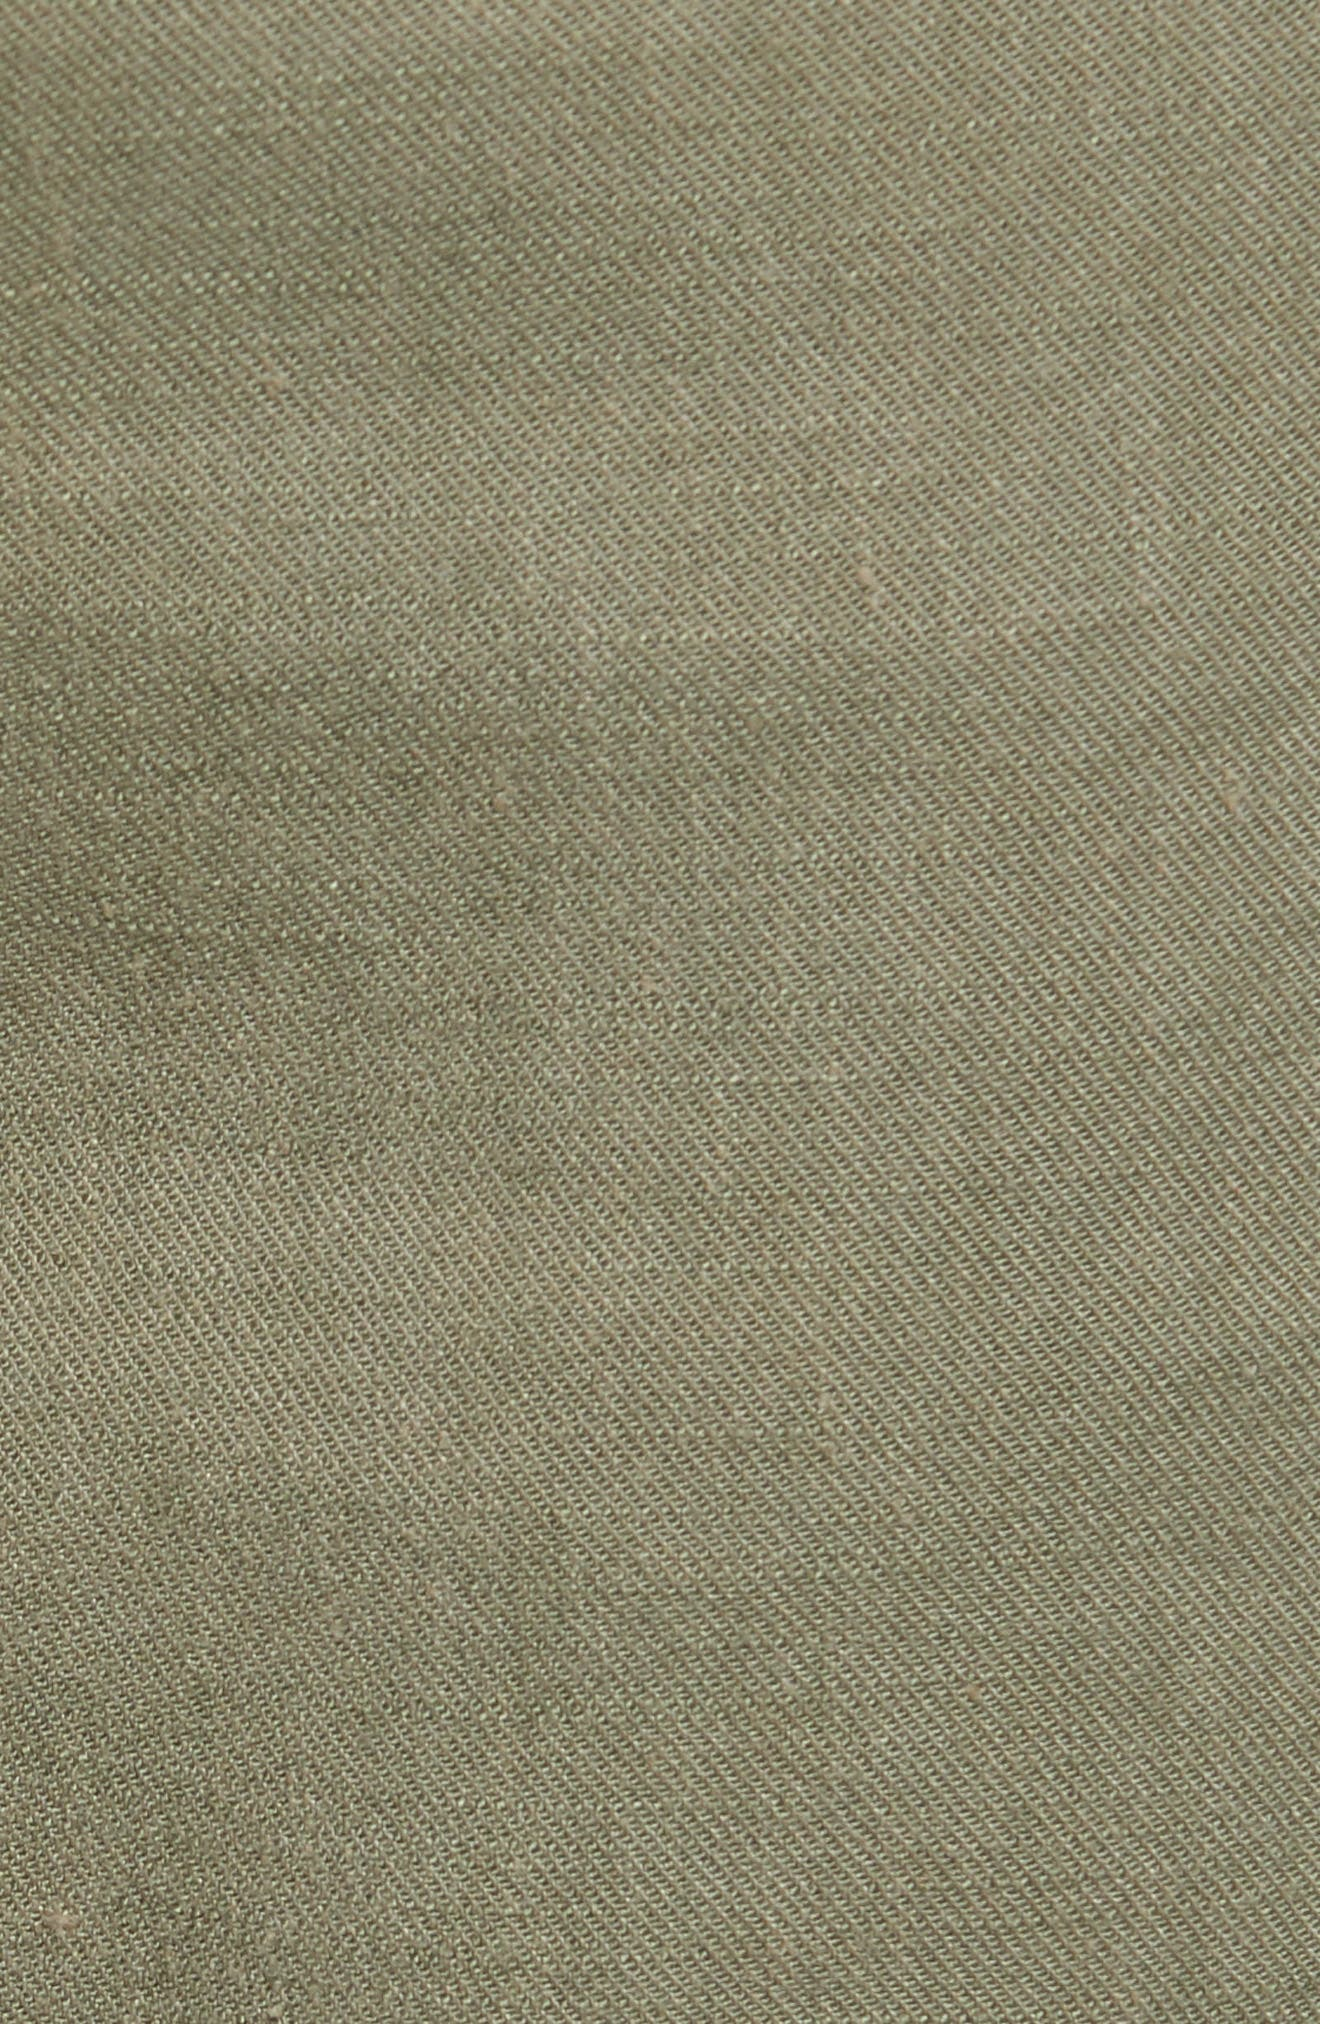 Stretch Linen Blend Bermuda Shorts,                             Alternate thumbnail 15, color,